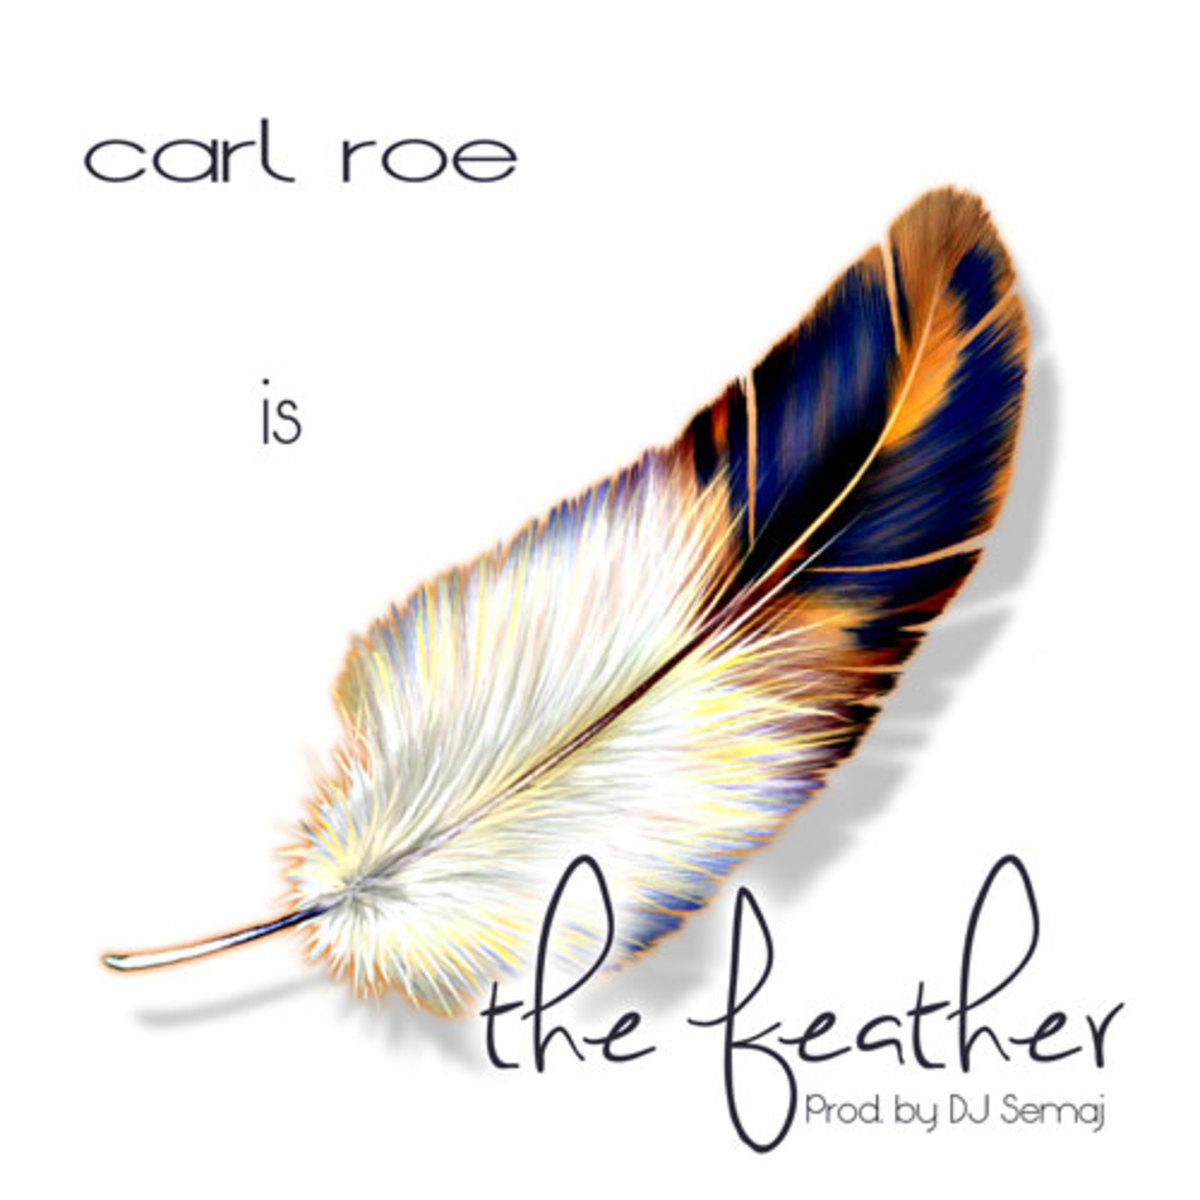 carlroe-thefeather.jpg